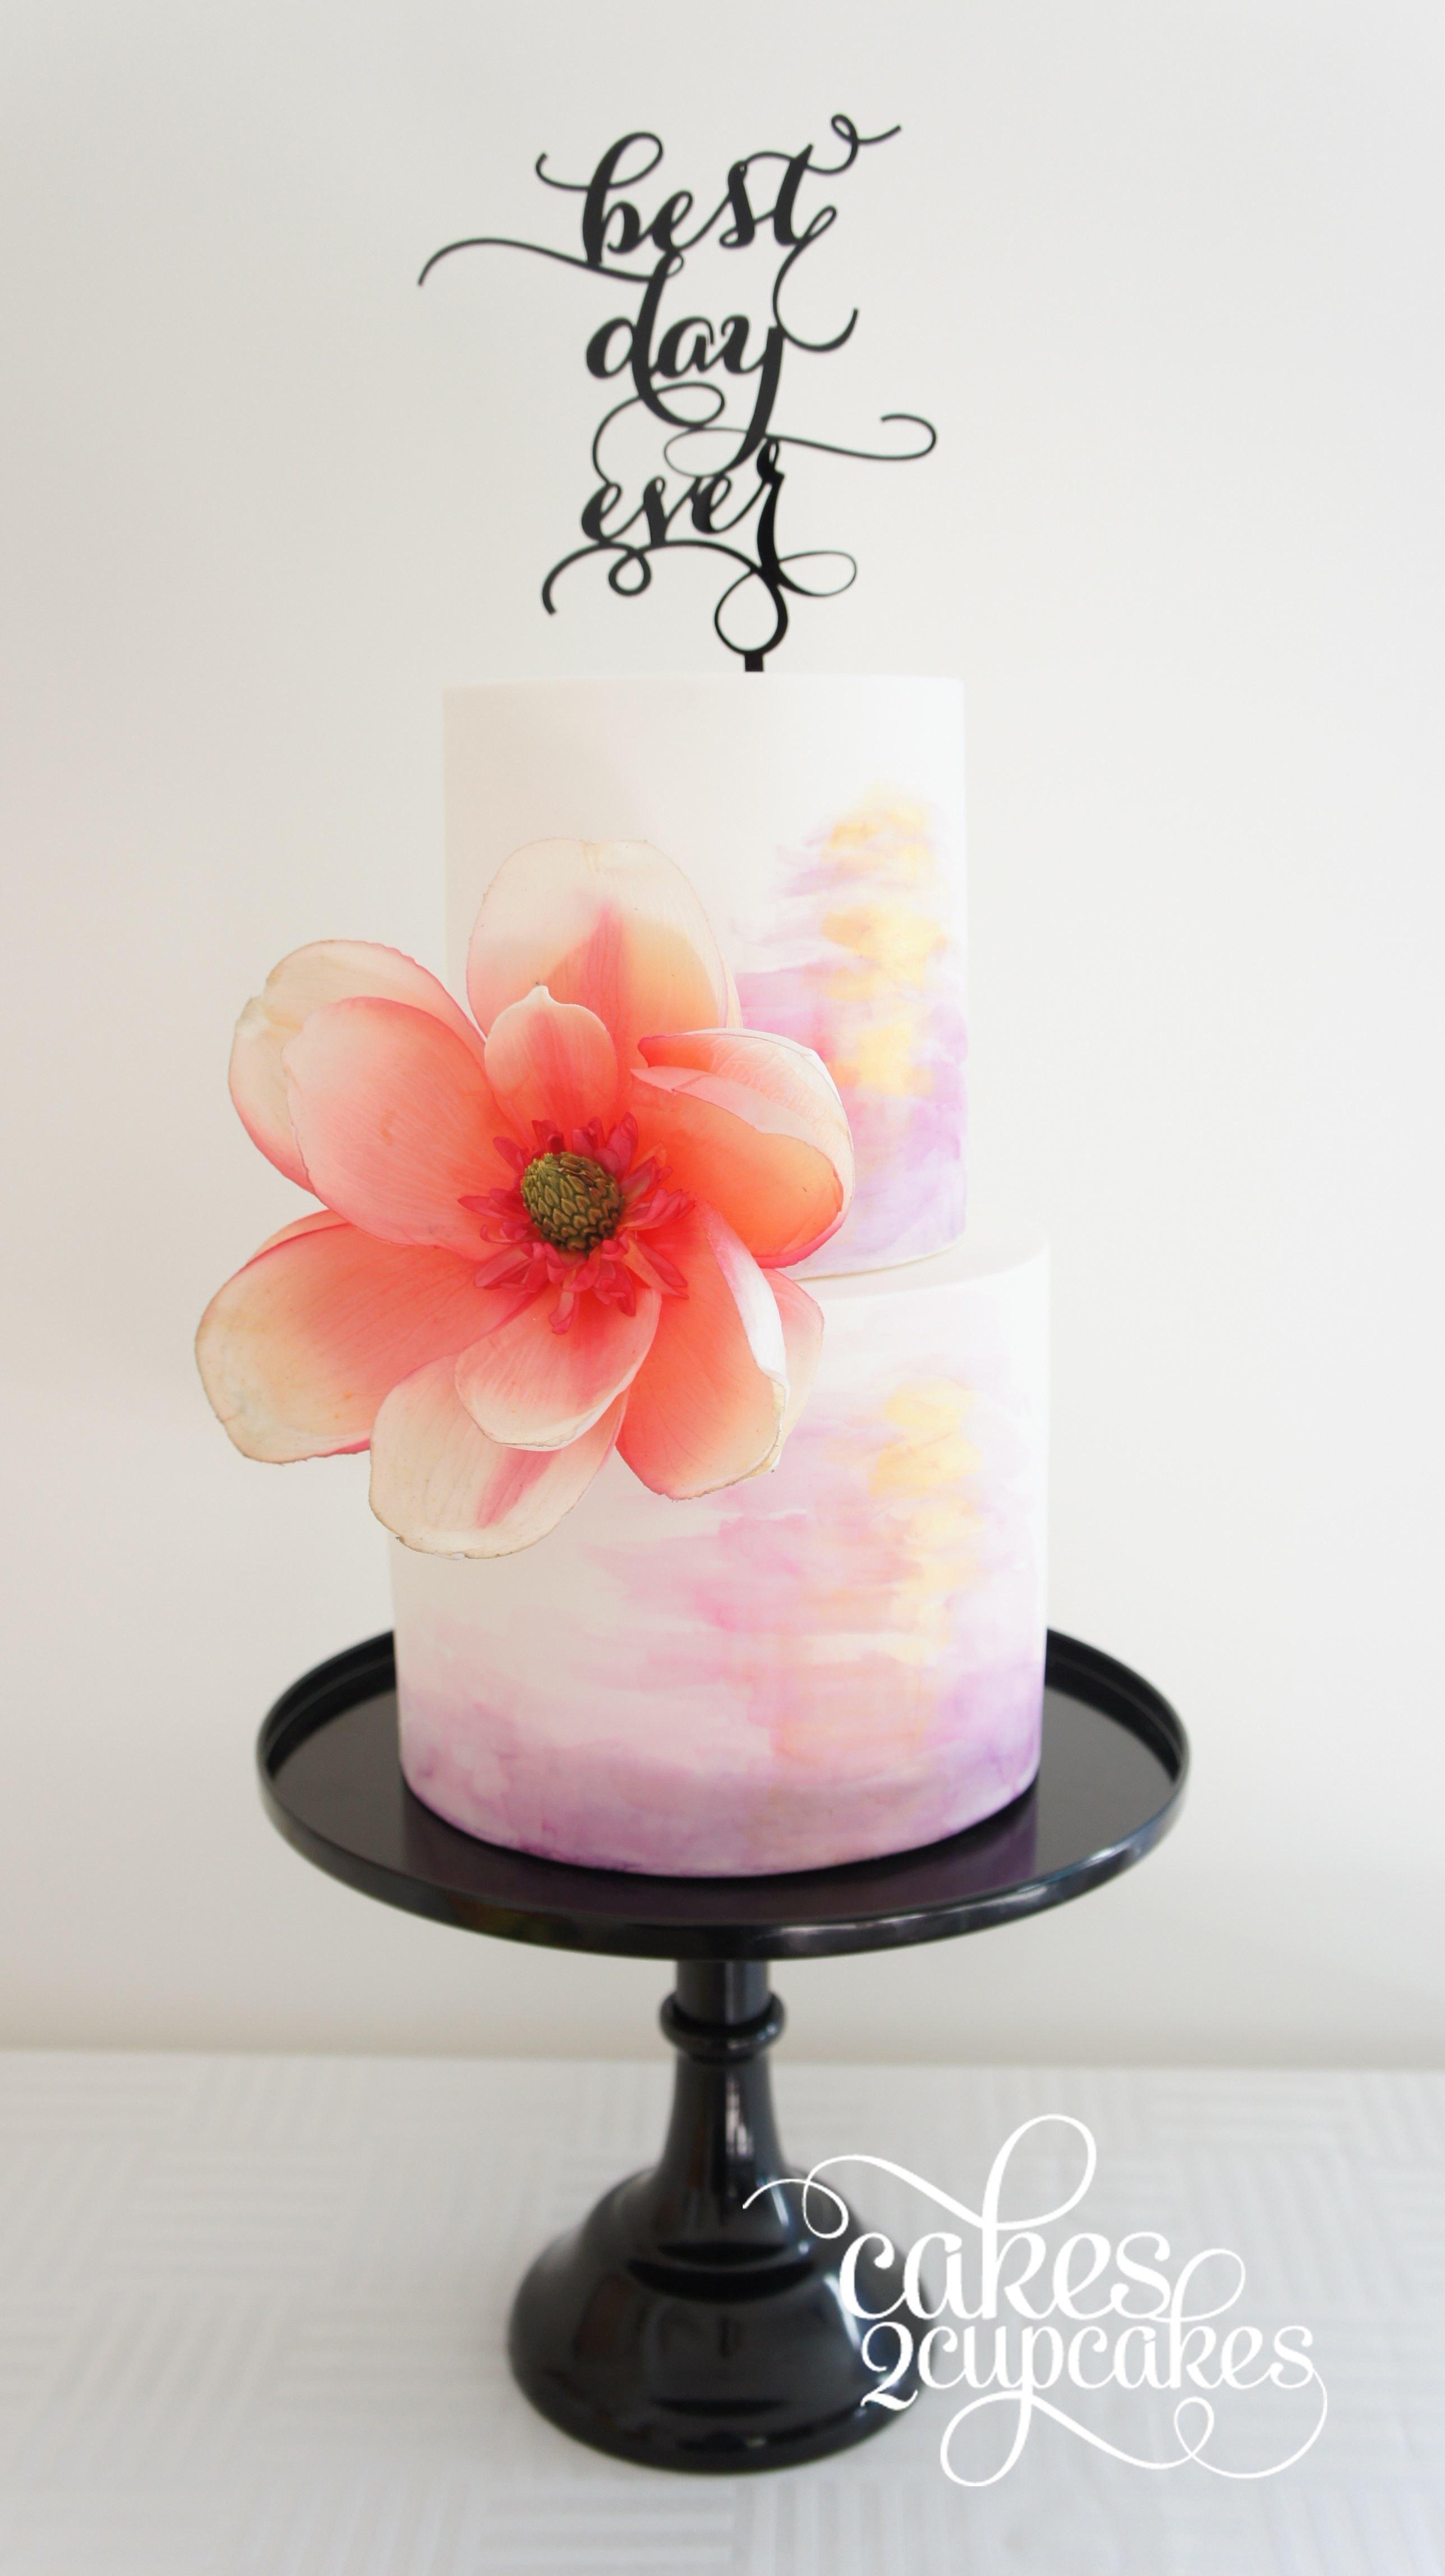 cakes2cupcakes-watercolour.jpg